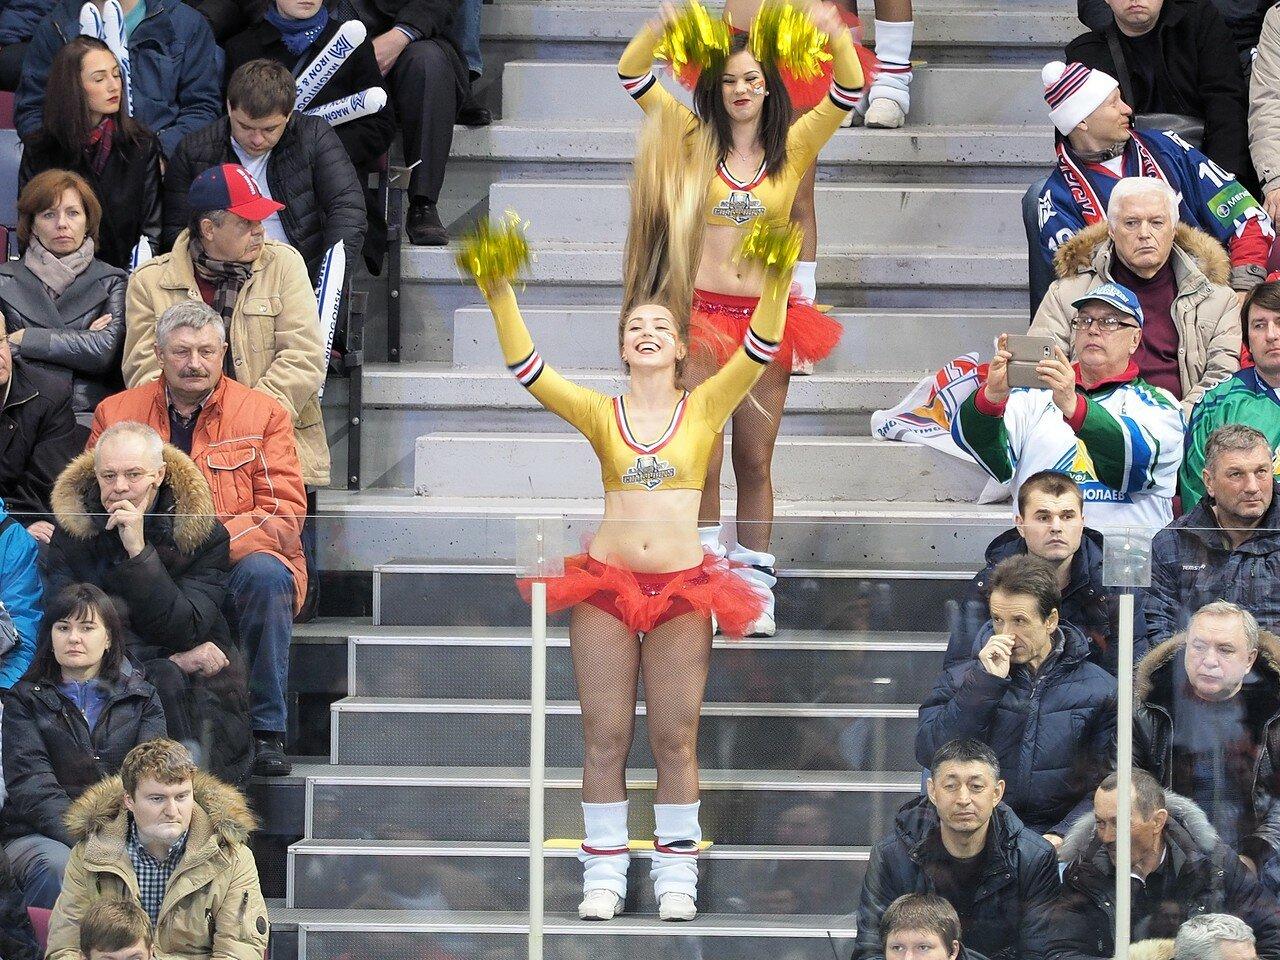 88Плей-офф 2016 Восток Финал Металлург - Салават Юлаев 23.03.2016